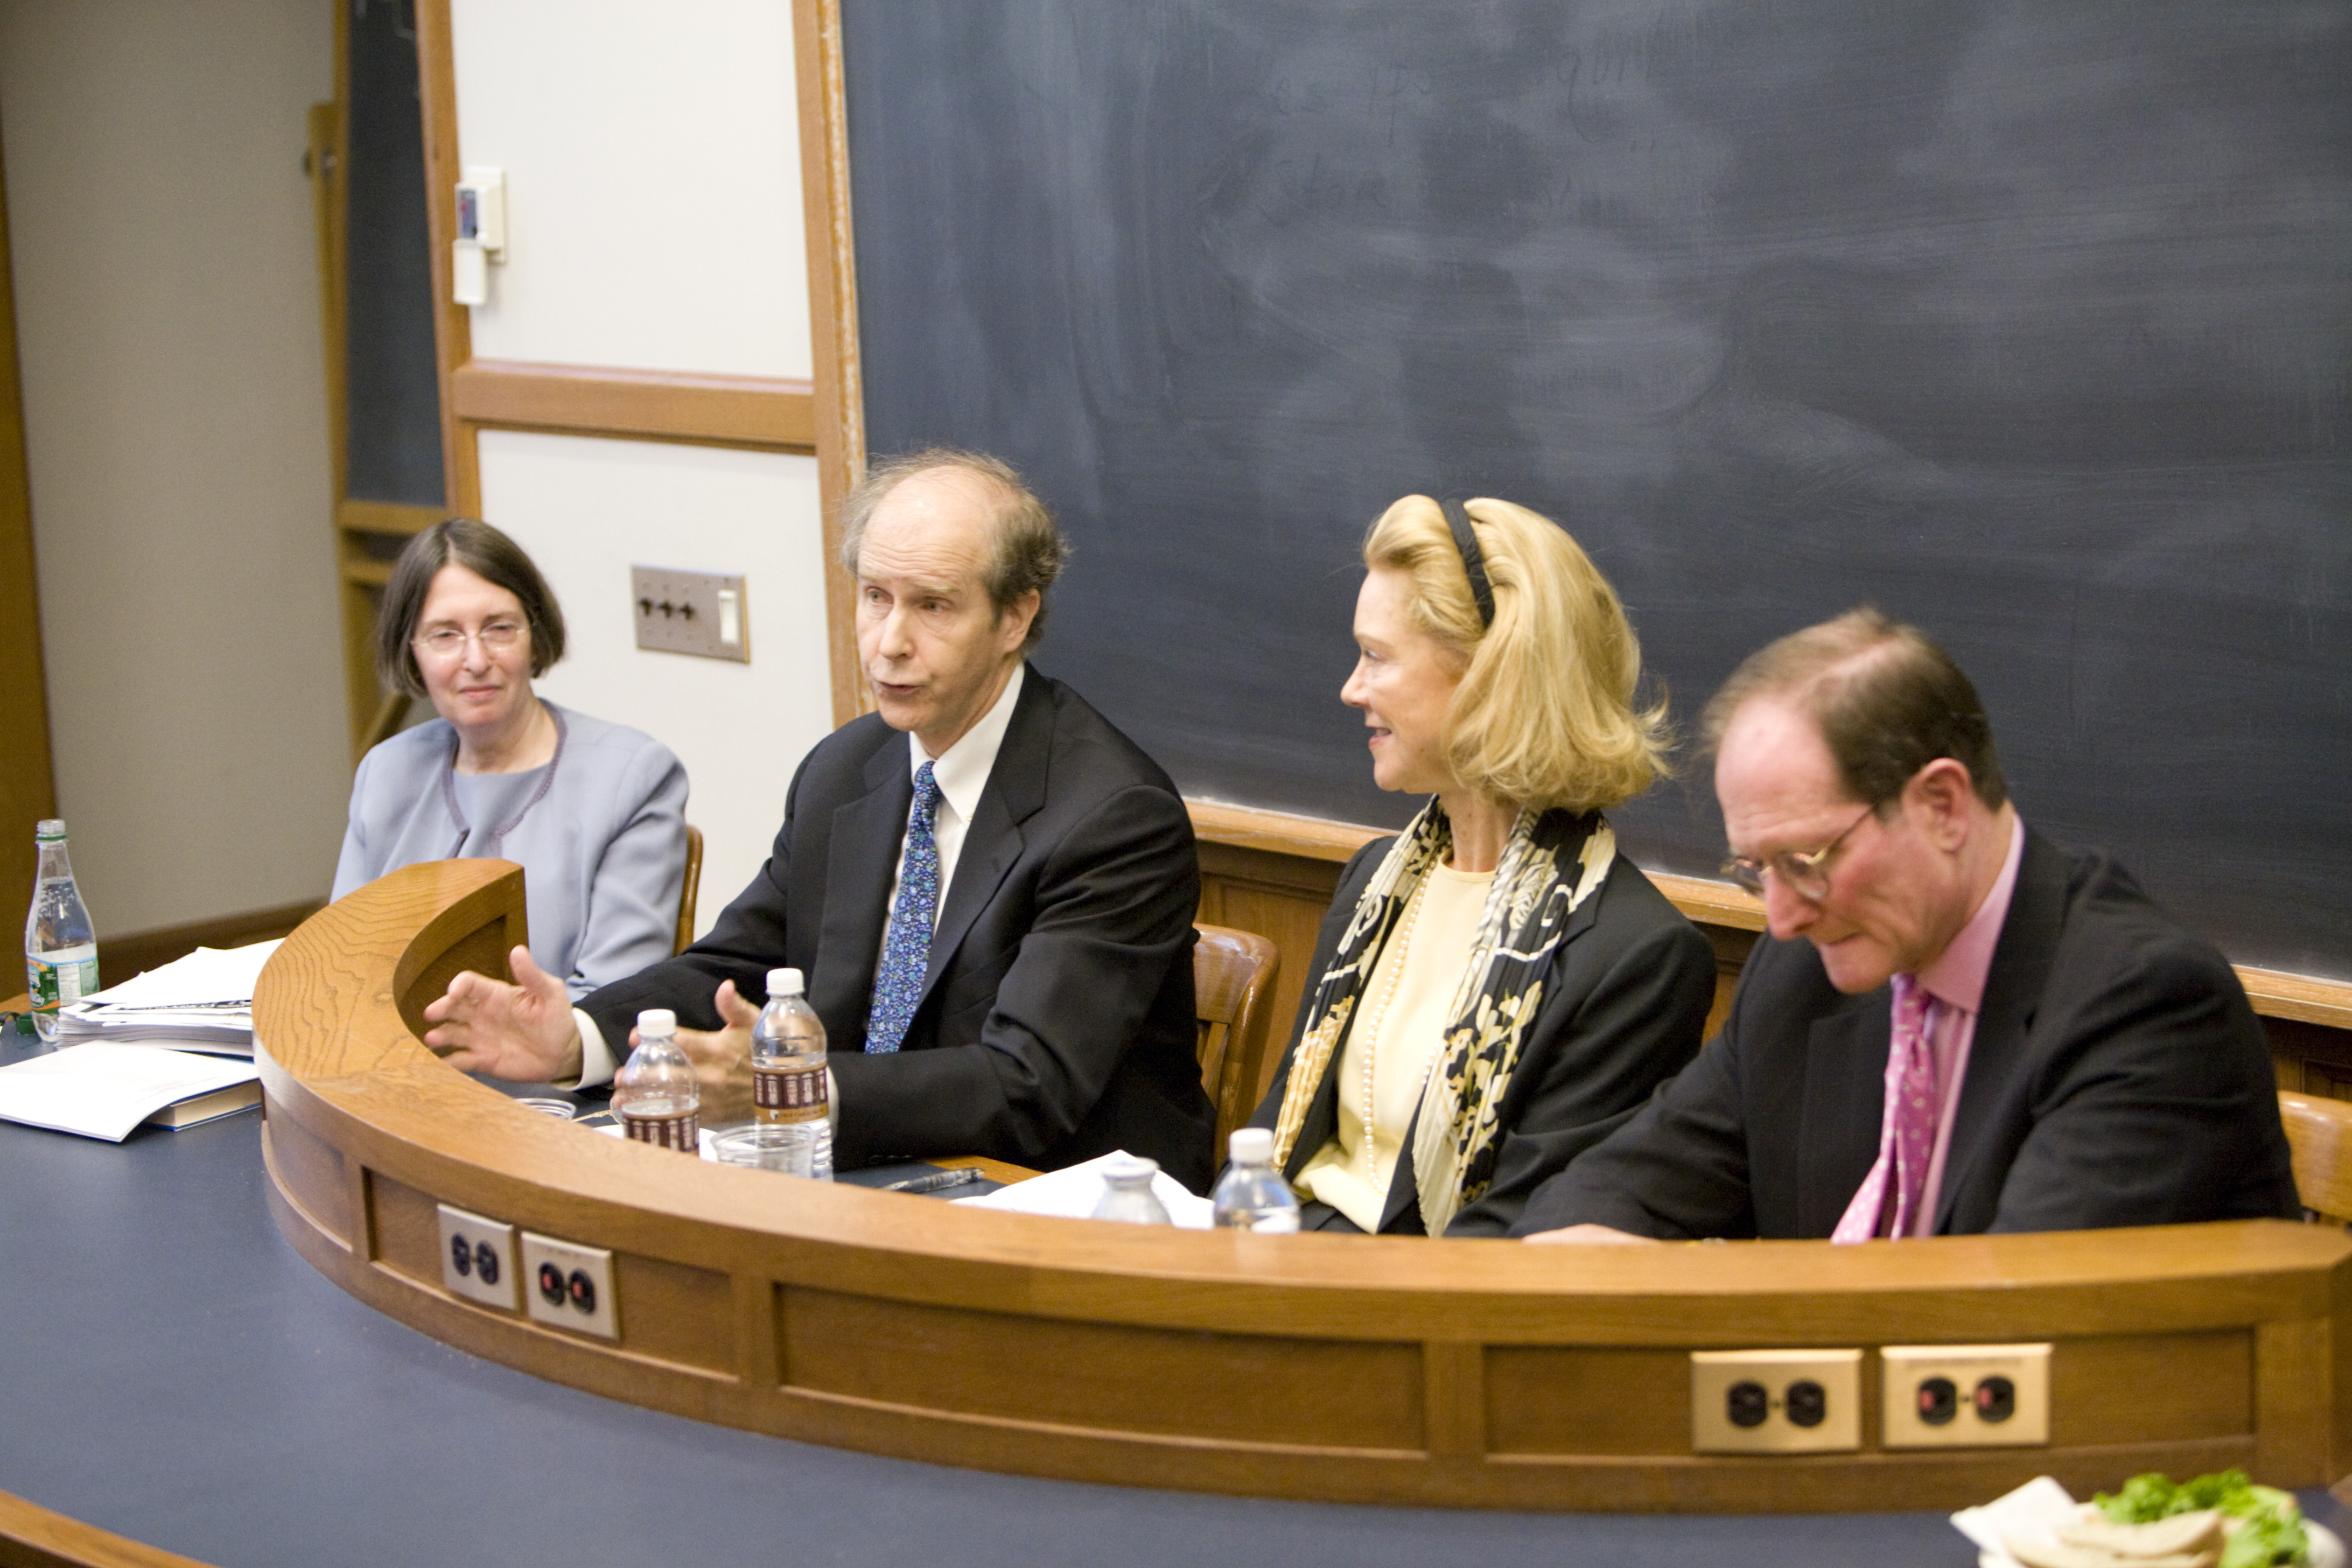 YLS Prof. and Center Dir. Roberta Romano '80, William McDavid '72, Siri Marshall '74, and Ben Heineman '71